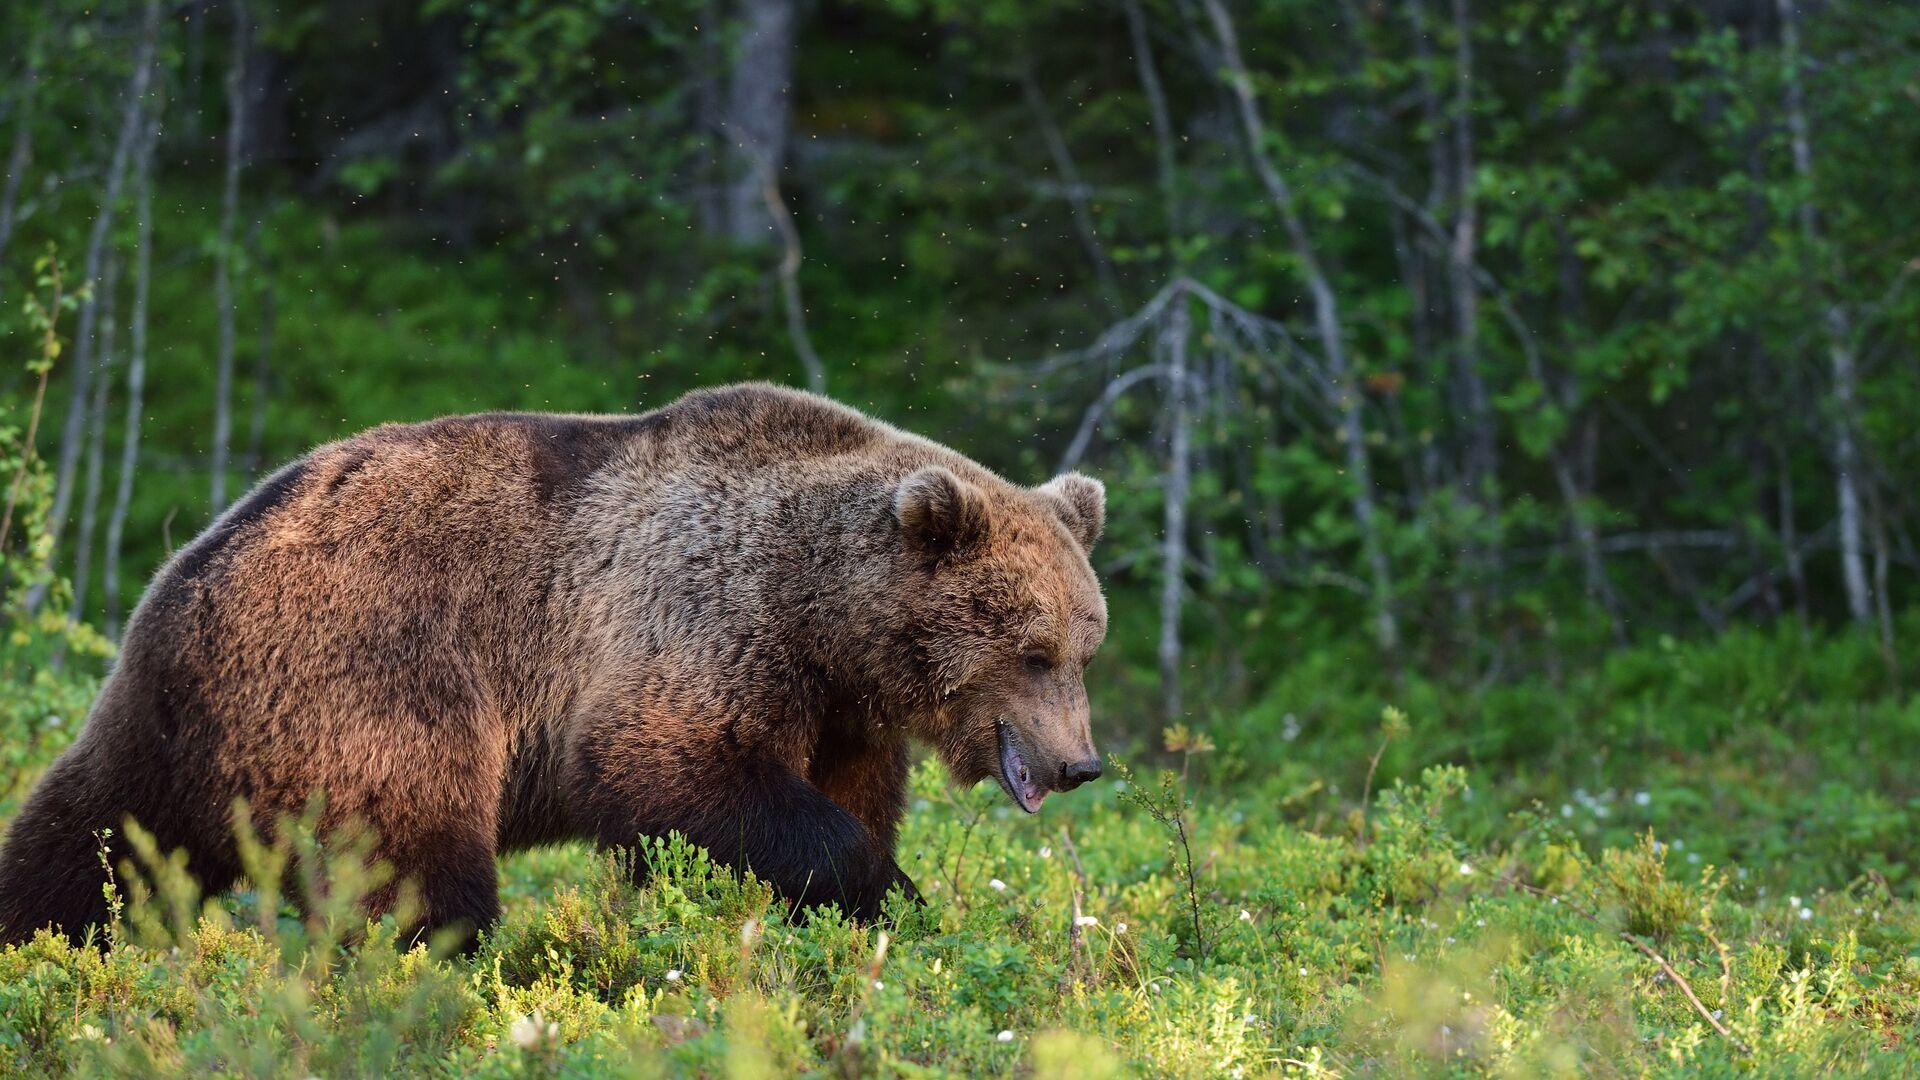 Бурый медведь - РИА Новости, 1920, 05.10.2020